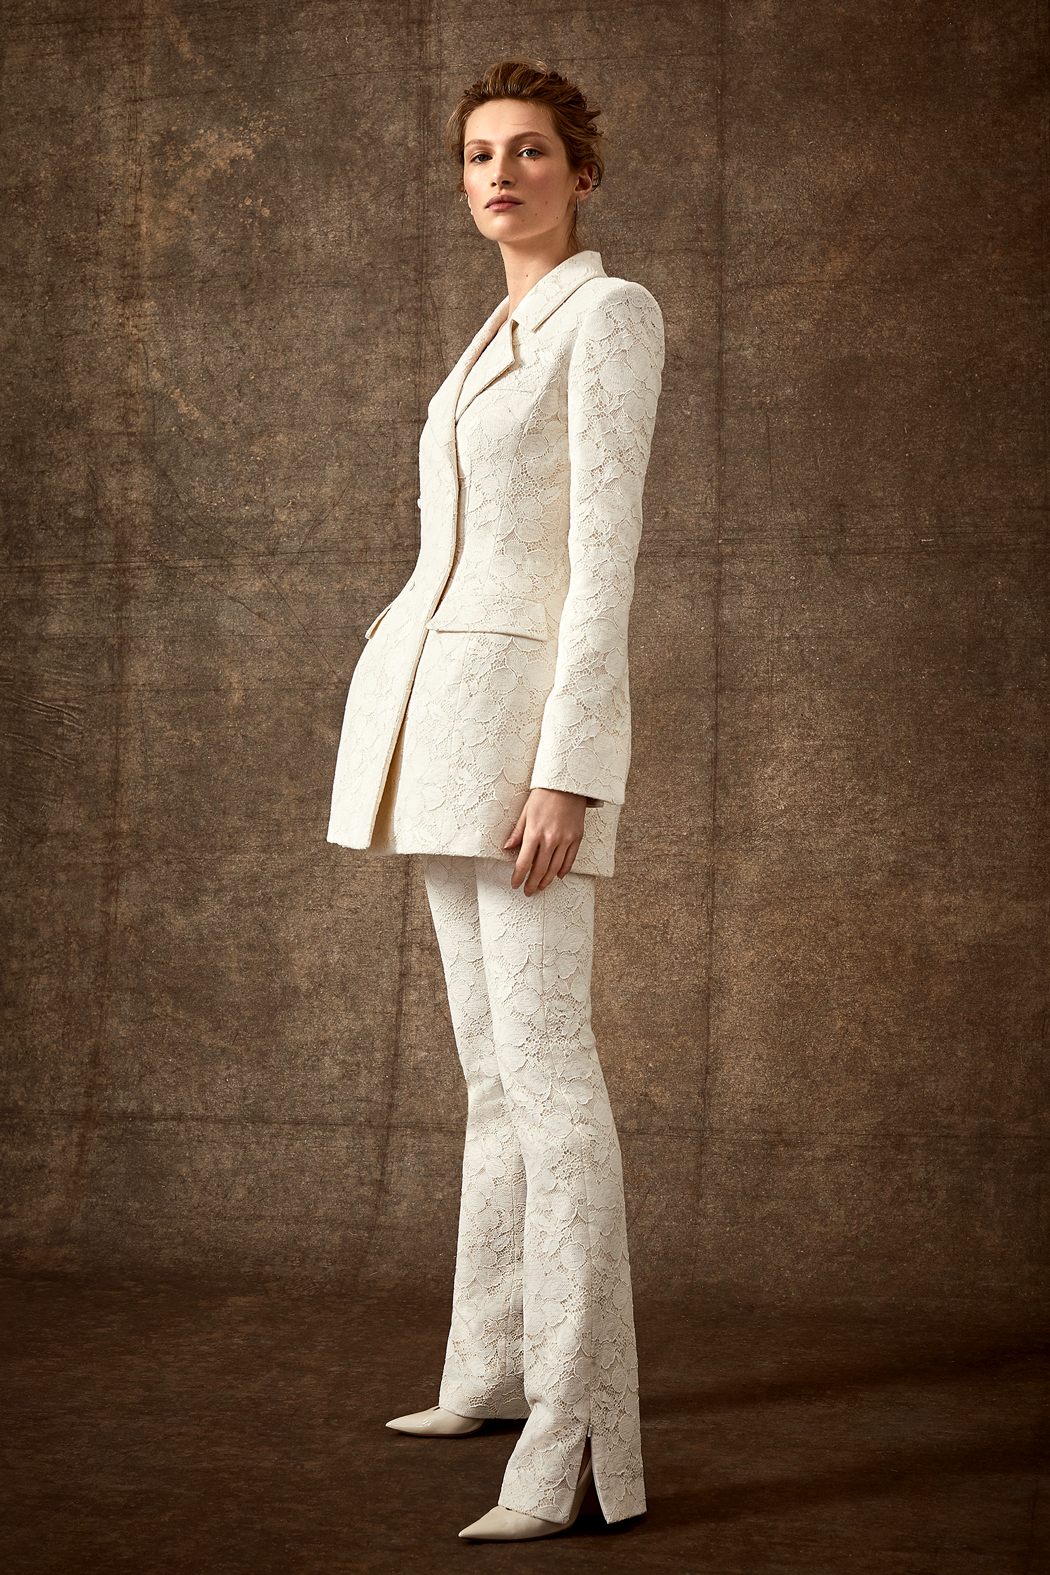 floral lace pantsuit v-neck wedding suit Danielle Frankel Spring 2020